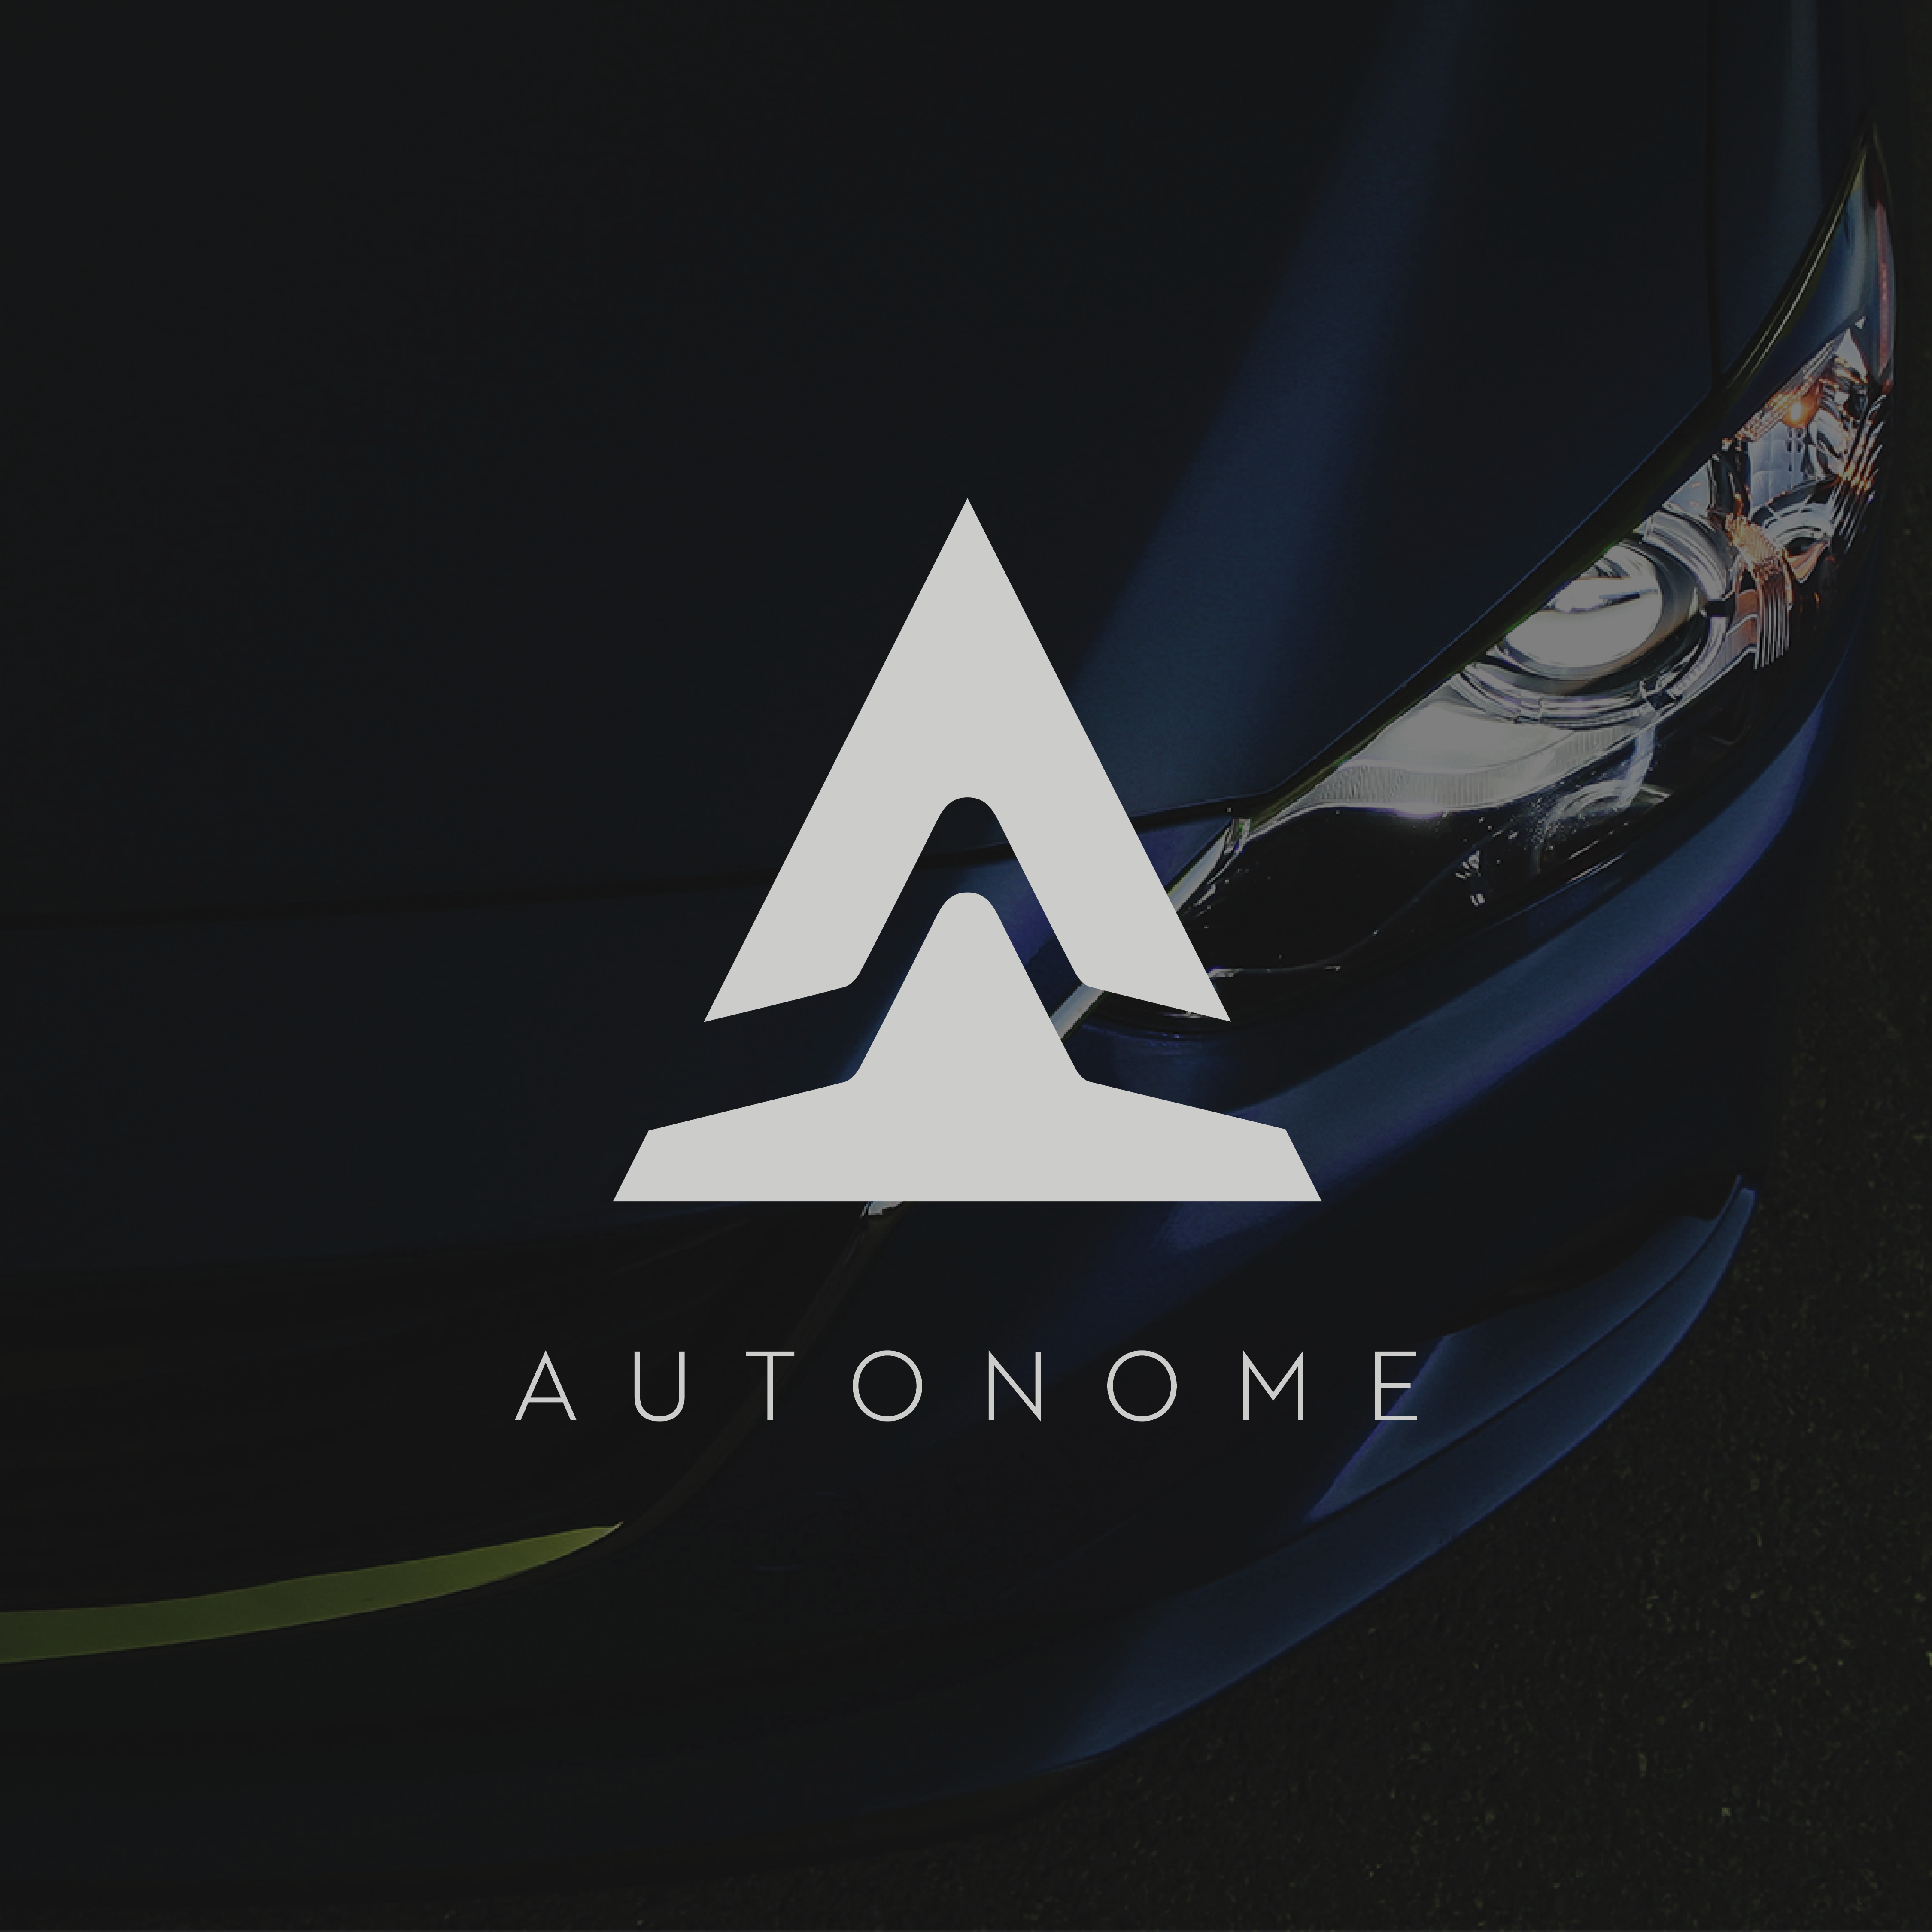 Autonome Logo